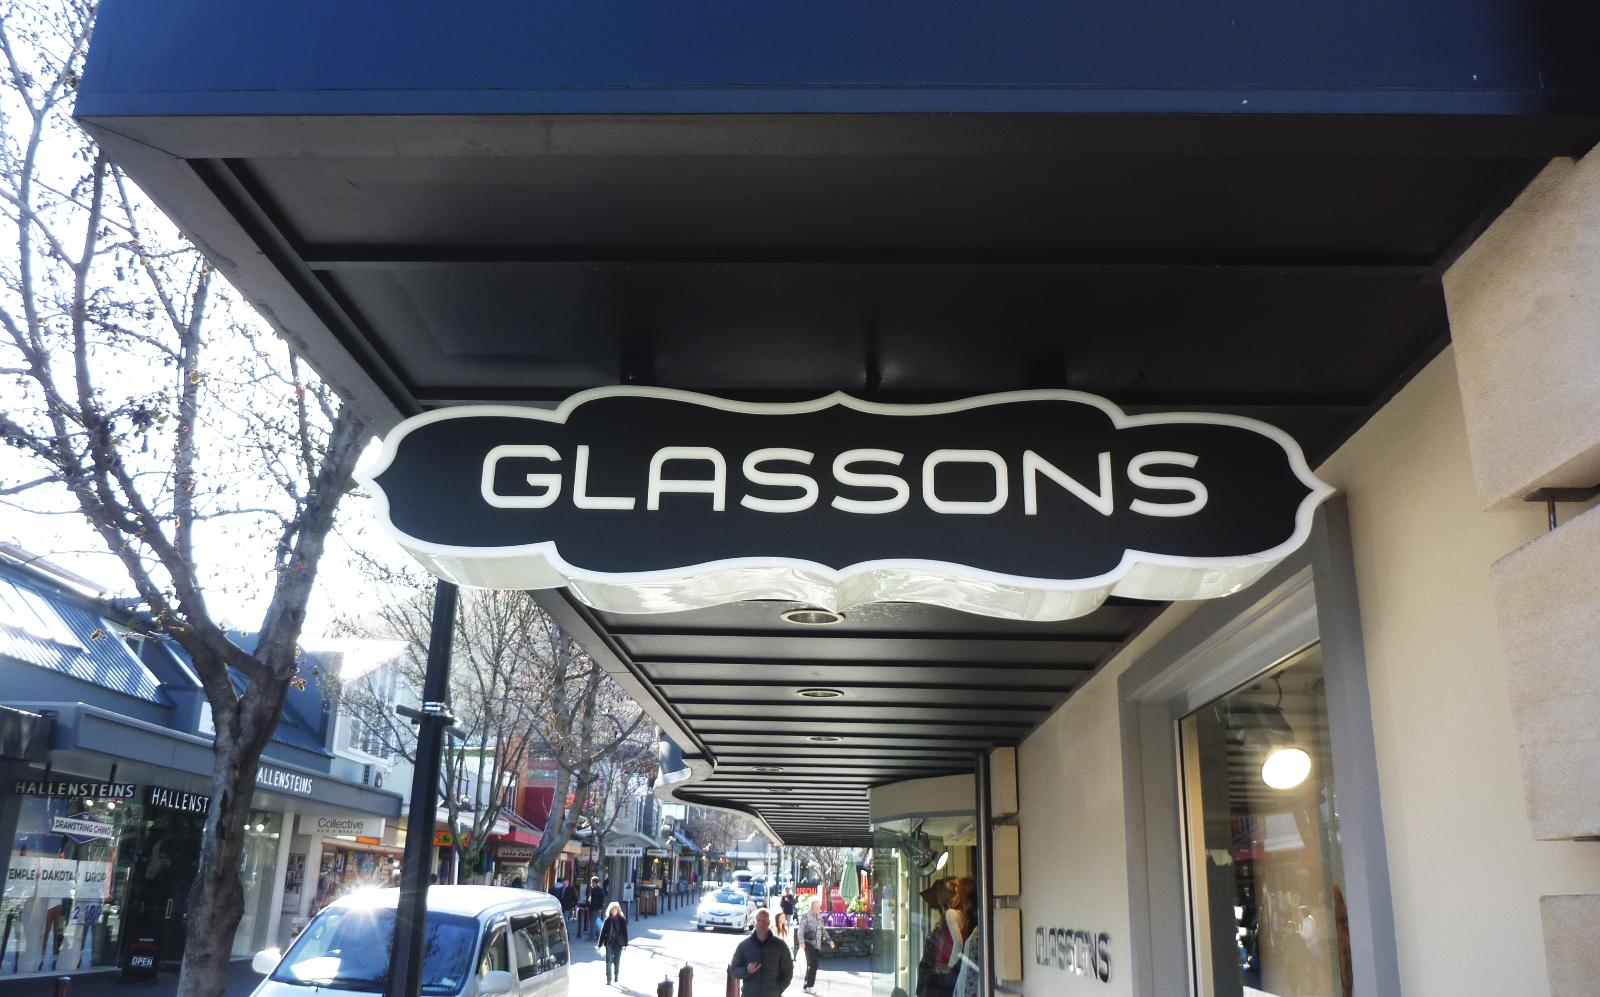 Glassons Lightbox Install